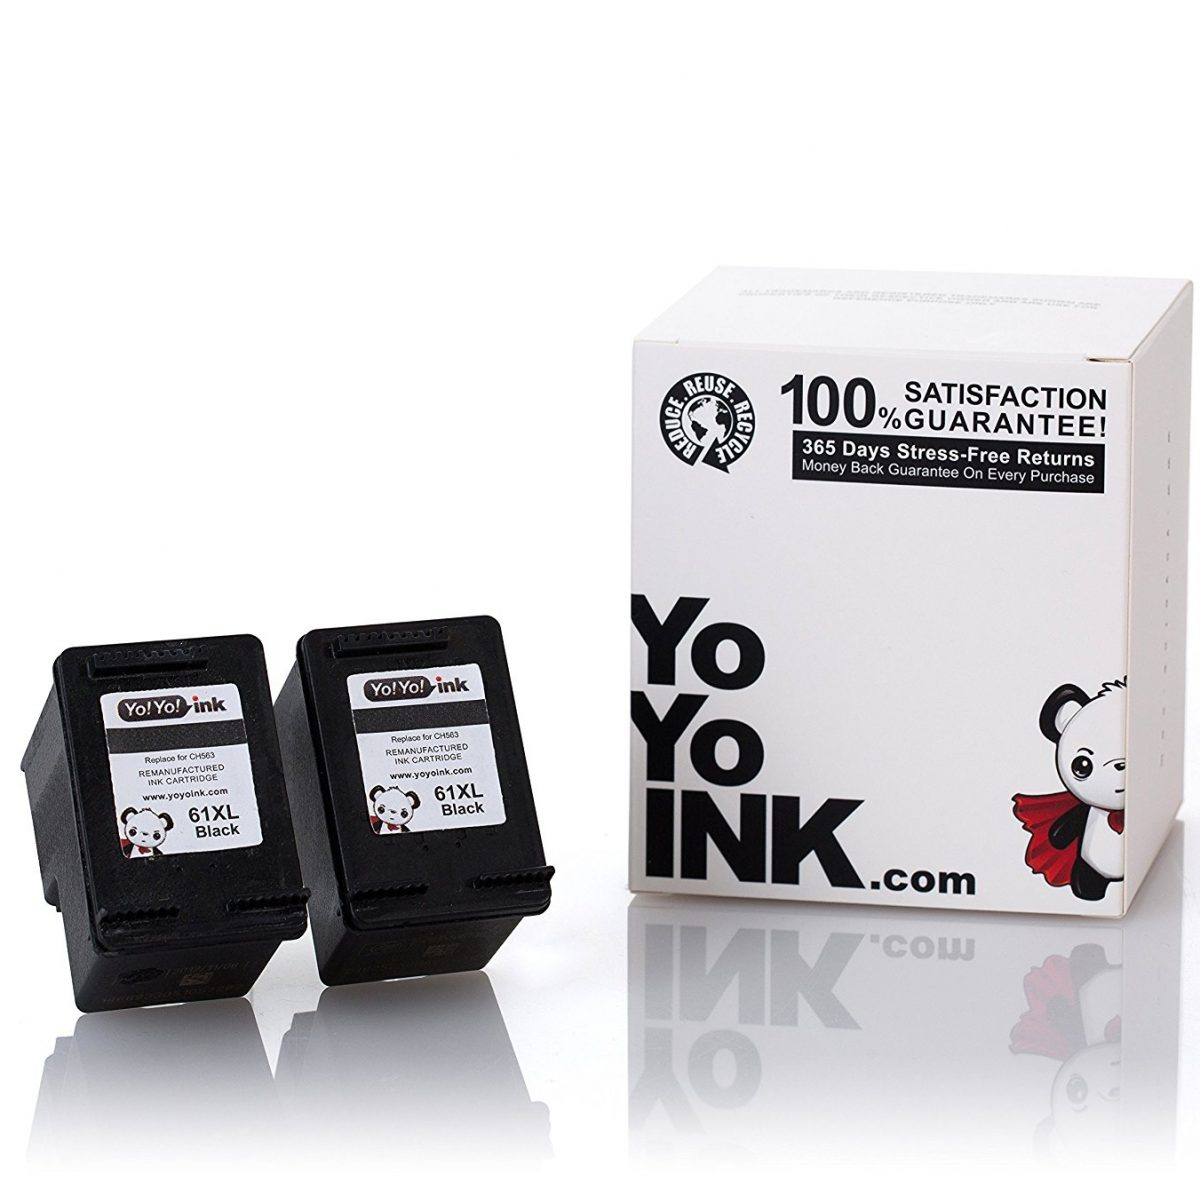 Remanufactured Hewlett Packard (HP 61XL) CH563WN Black High Yield Ink Cartridge (2 Black)